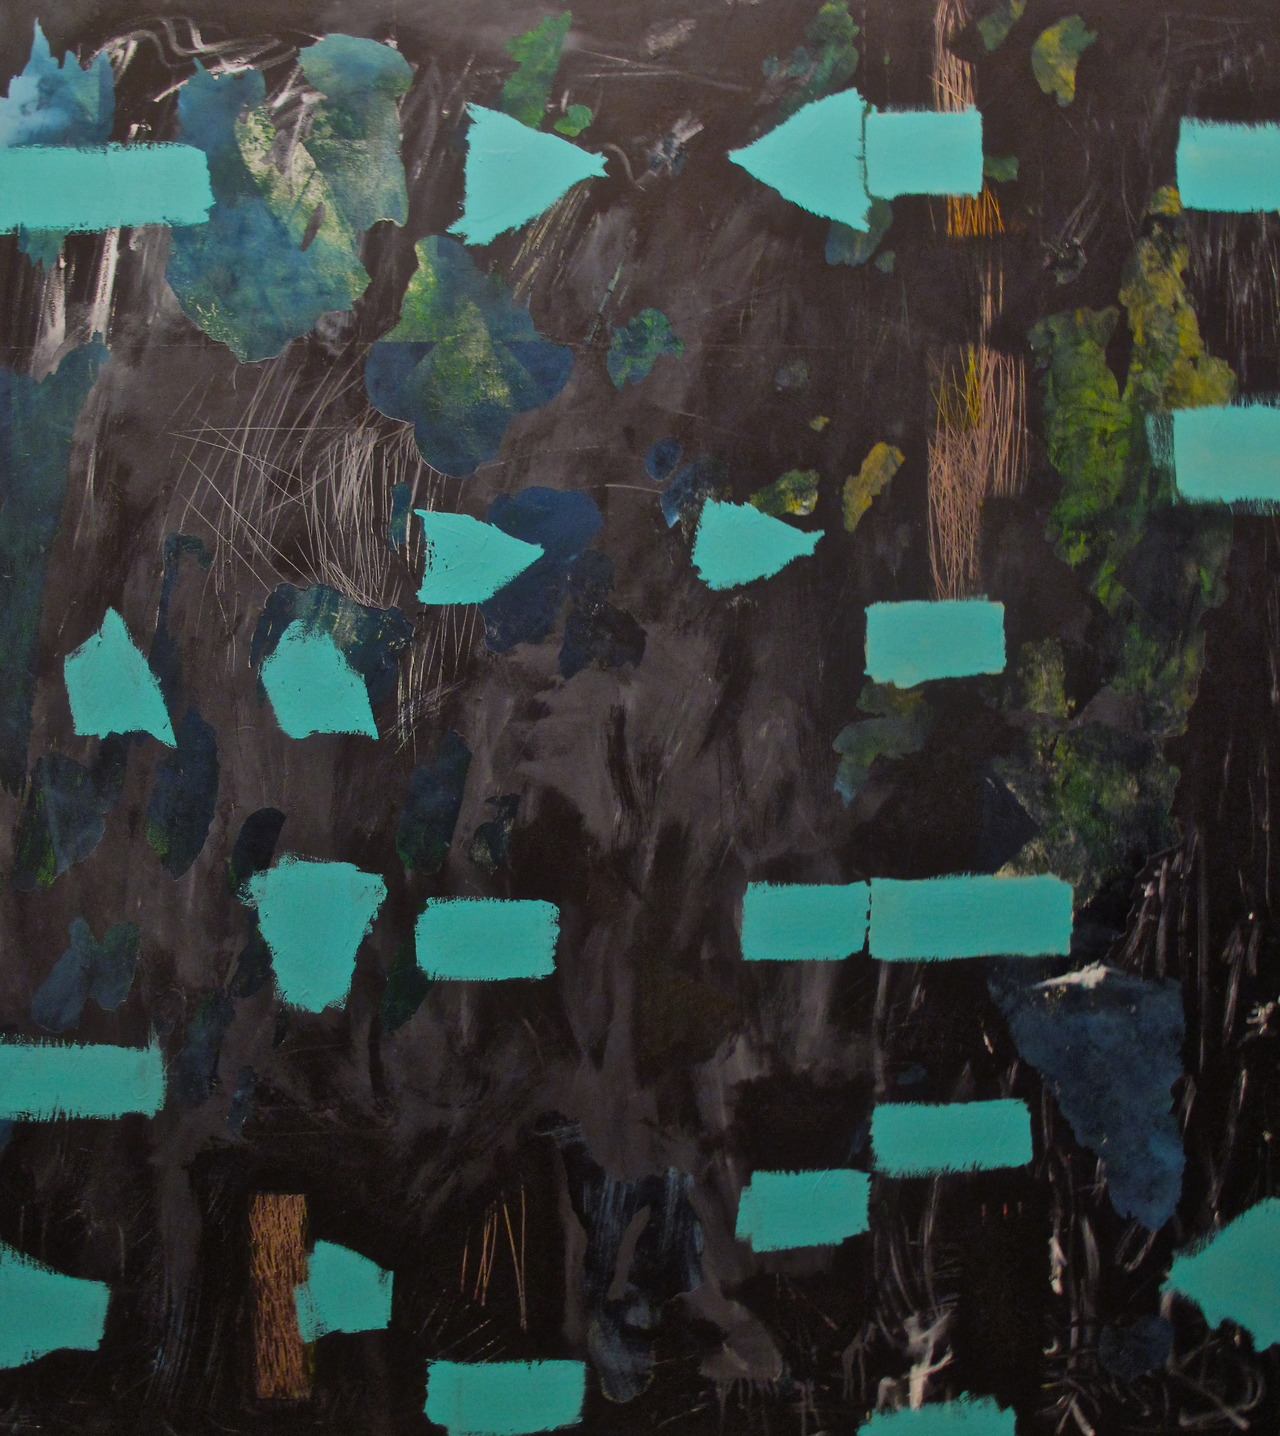 K черту  , 2013. Acrylic on canvas. 72 x 64.